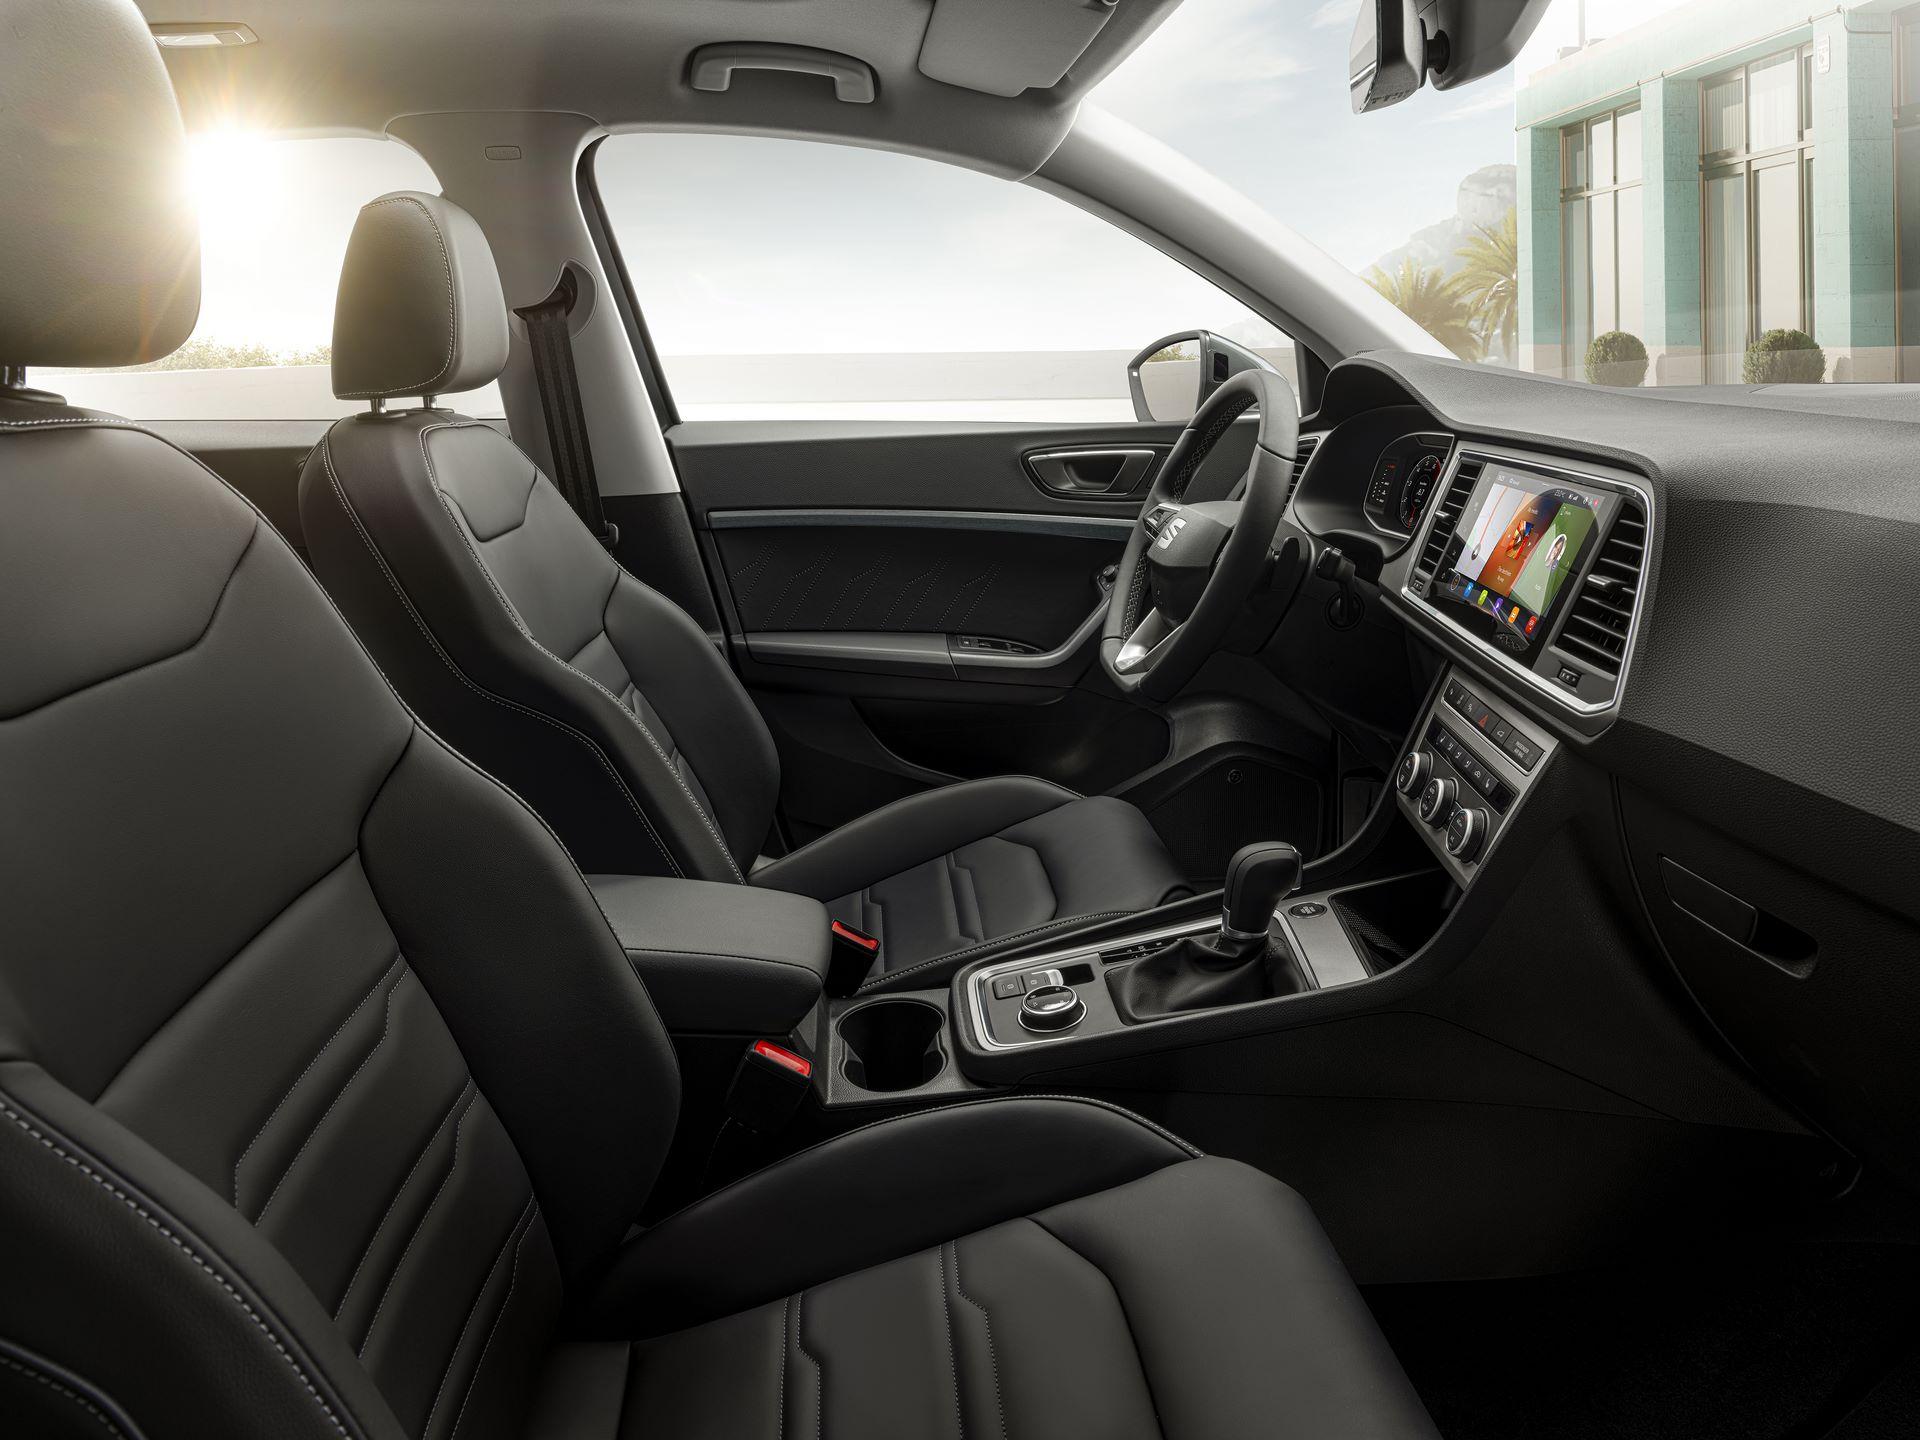 Seat-Ateca-facelift-2020-13